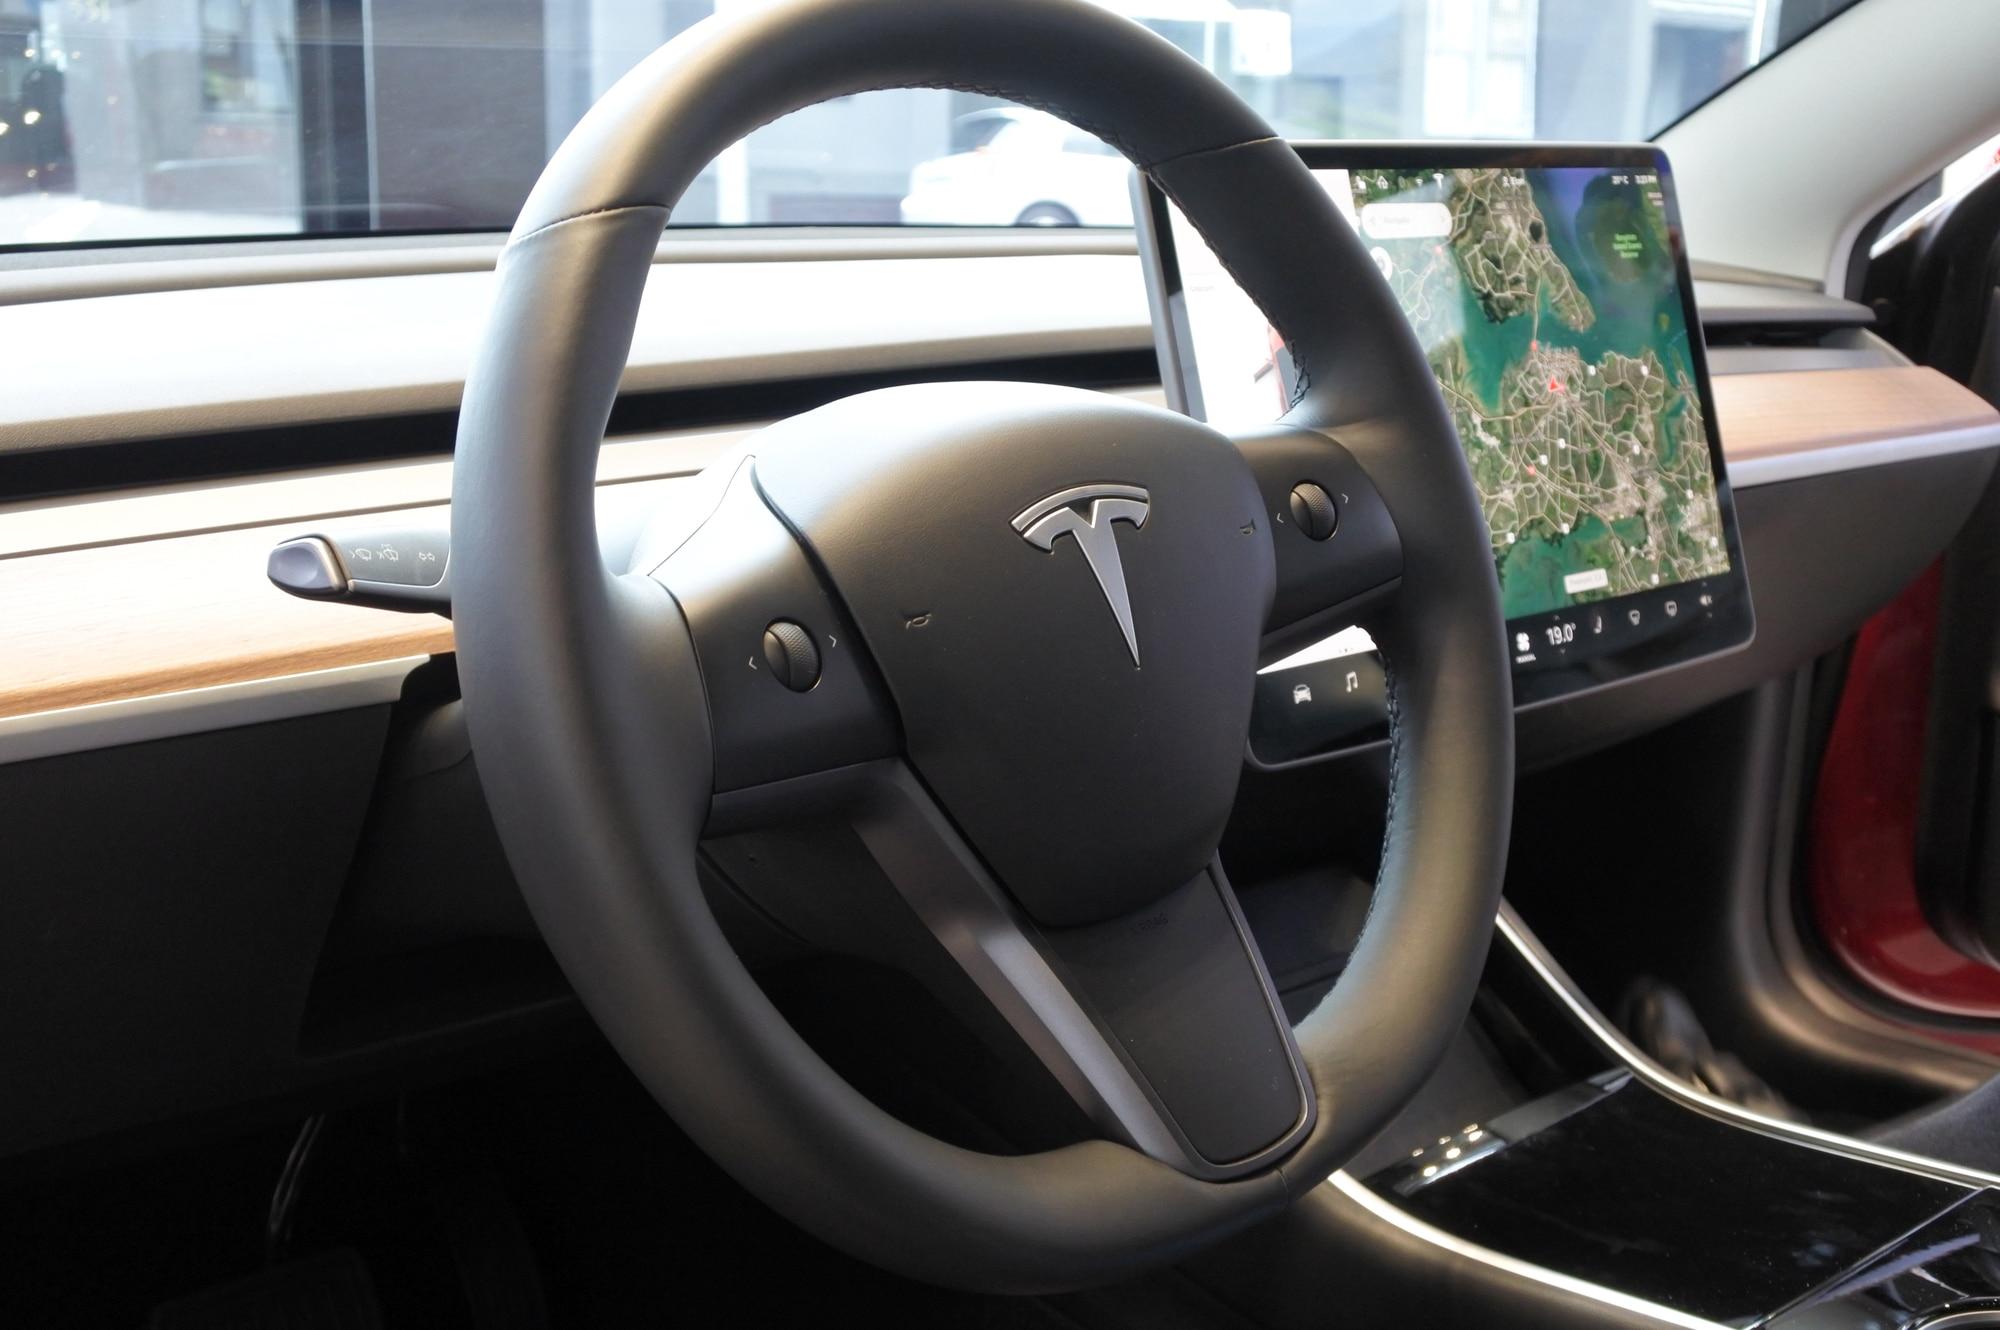 L'Autopilot di Tesla finisce sotto indagine negli USA thumbnail